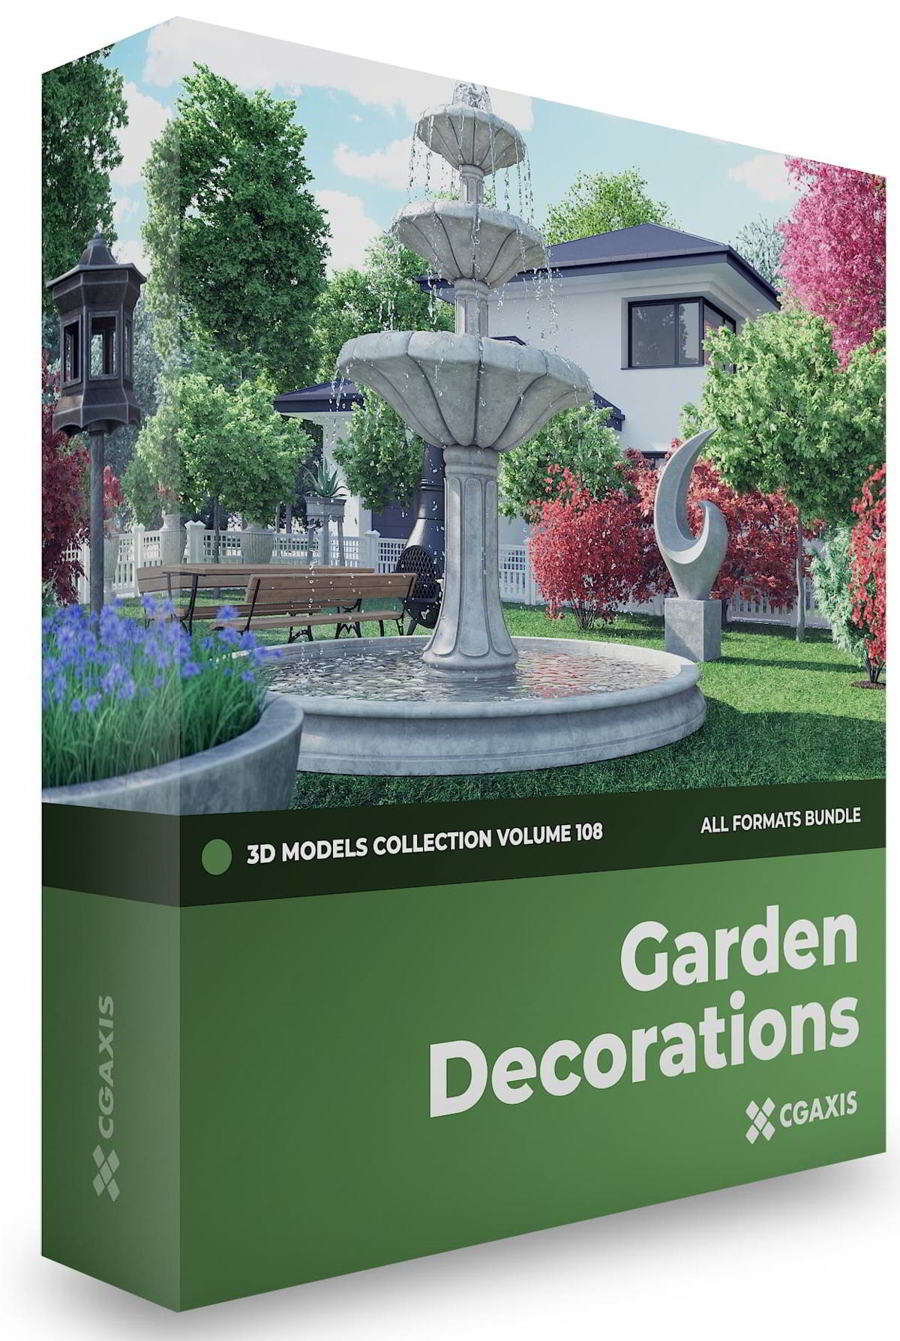 دانلود رایگان مدل سه بعدی تزئینی باغ CGAxis – Garden Decorations 3D Models Collection – Volume 108